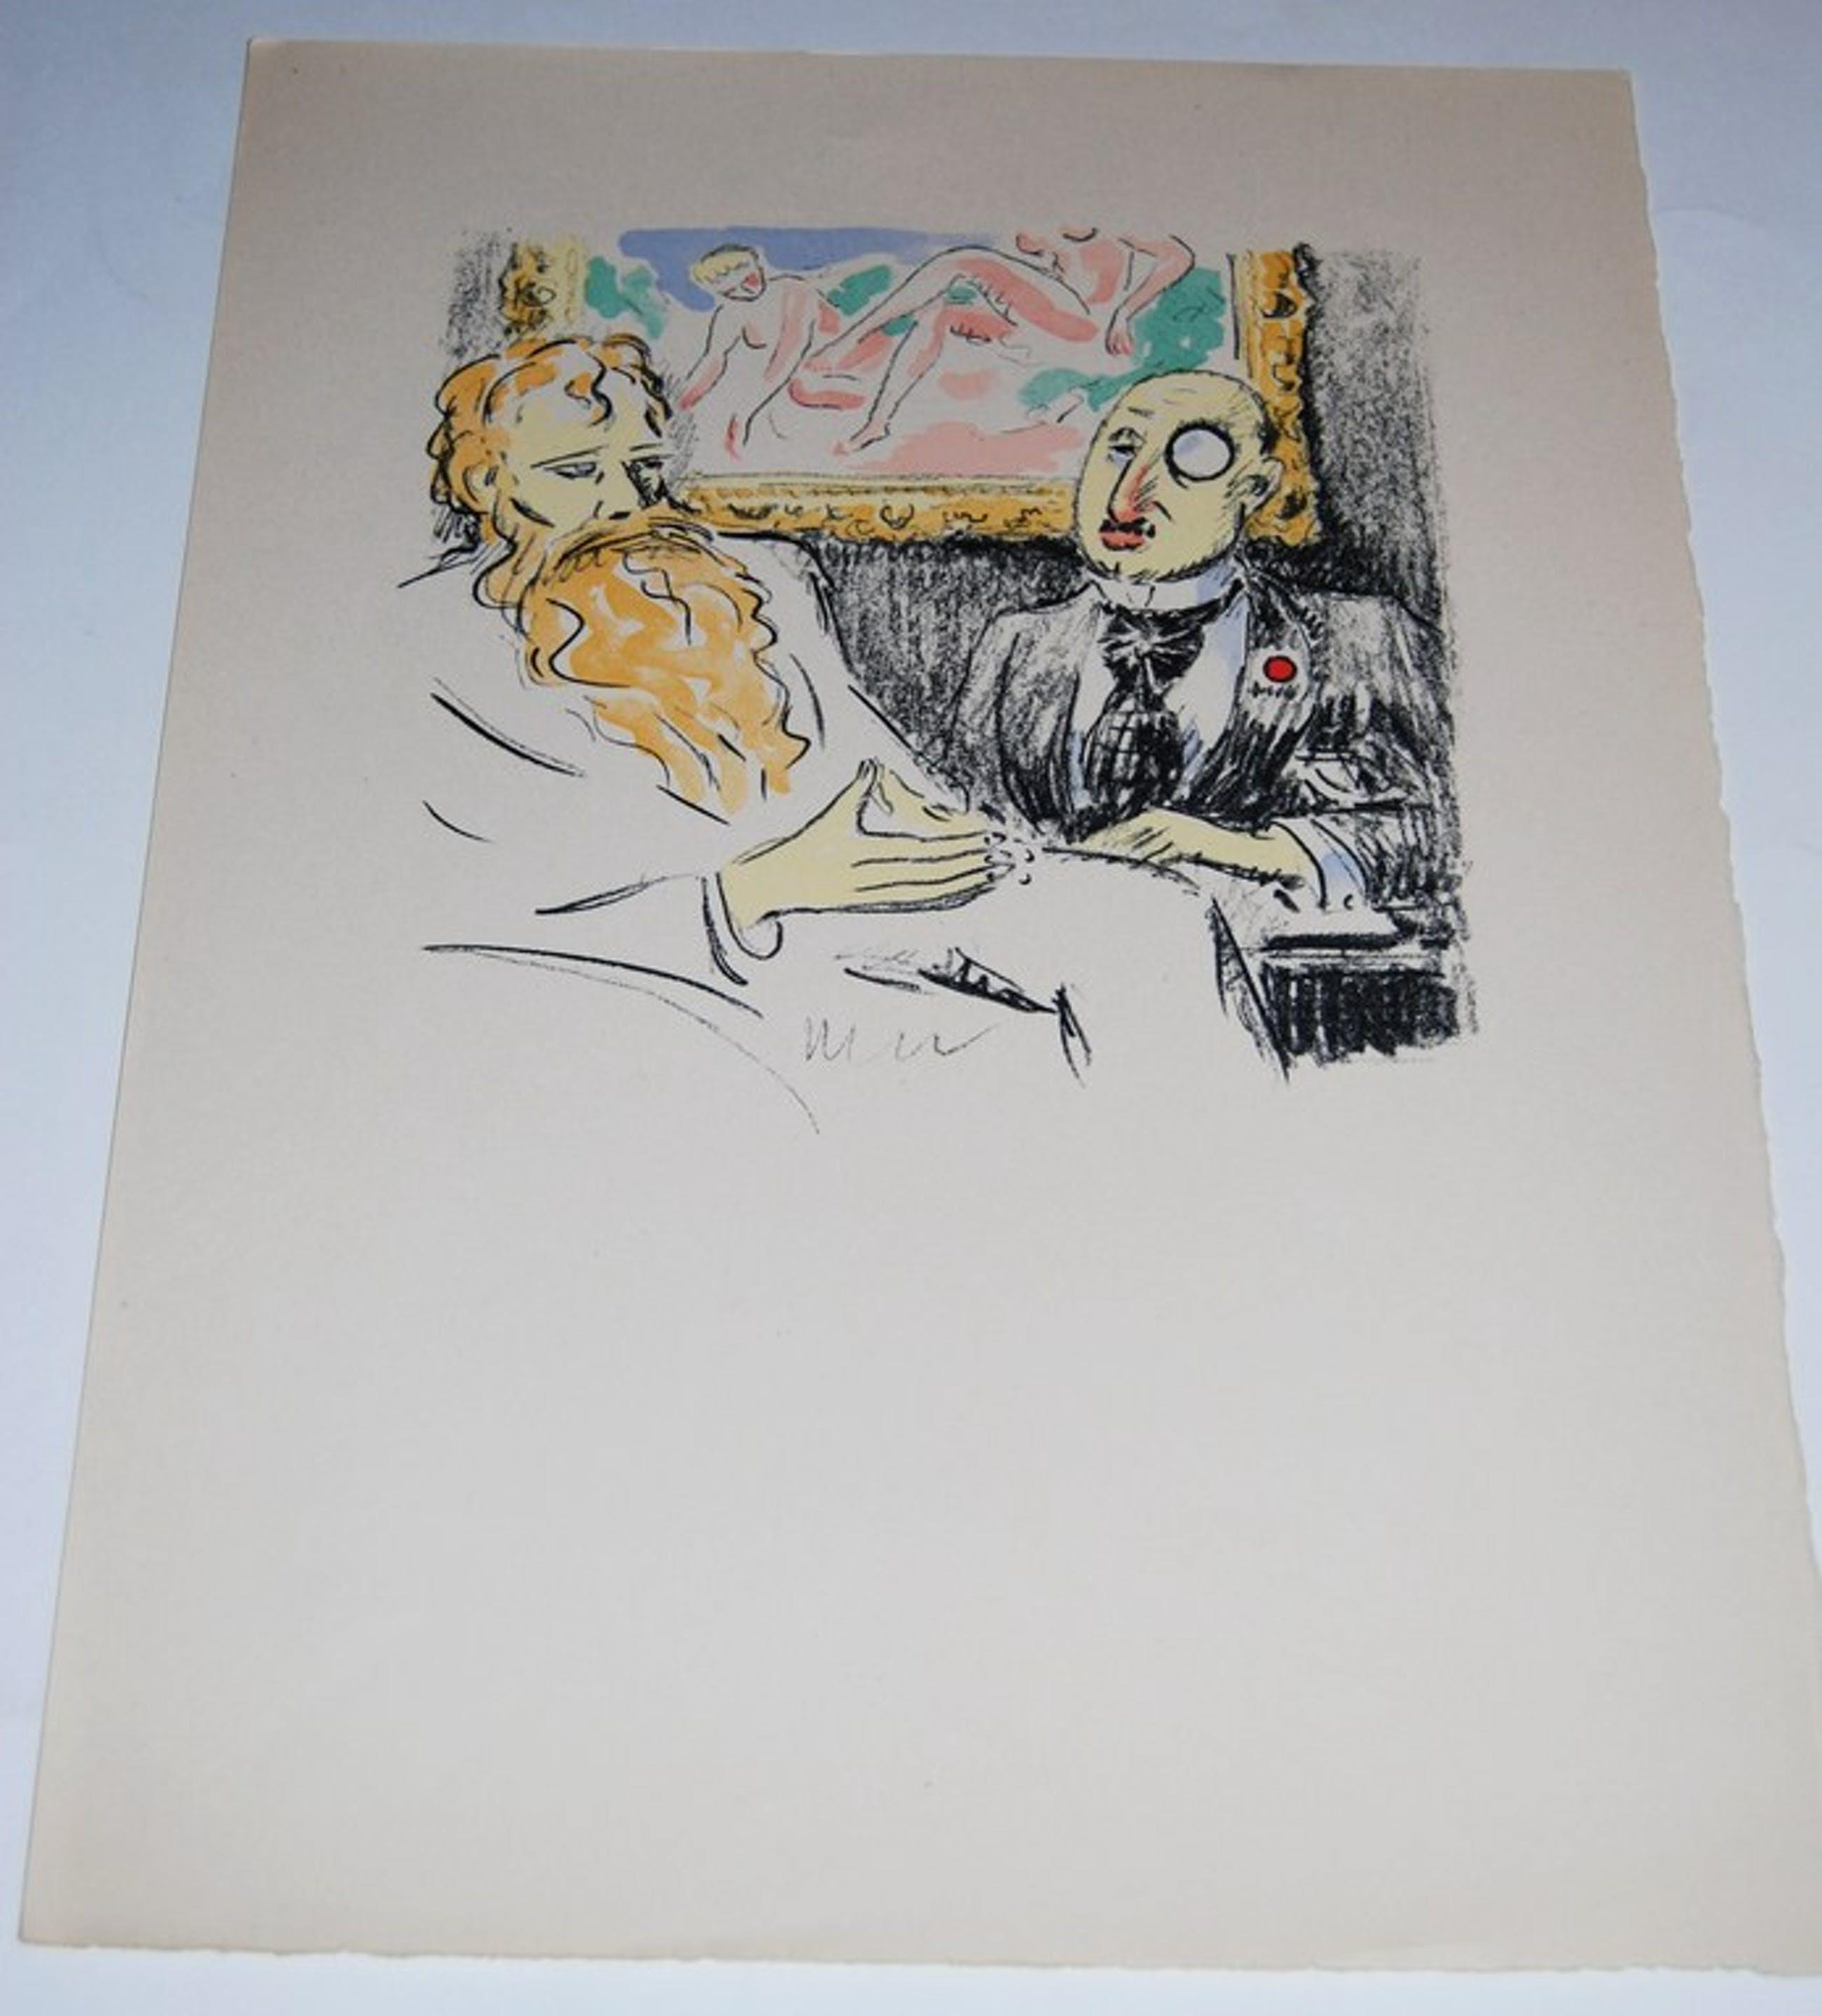 Kees van Dongen, La Revolte des Anges, Litho Mourlot, 1951 kopen? Bied vanaf 120!